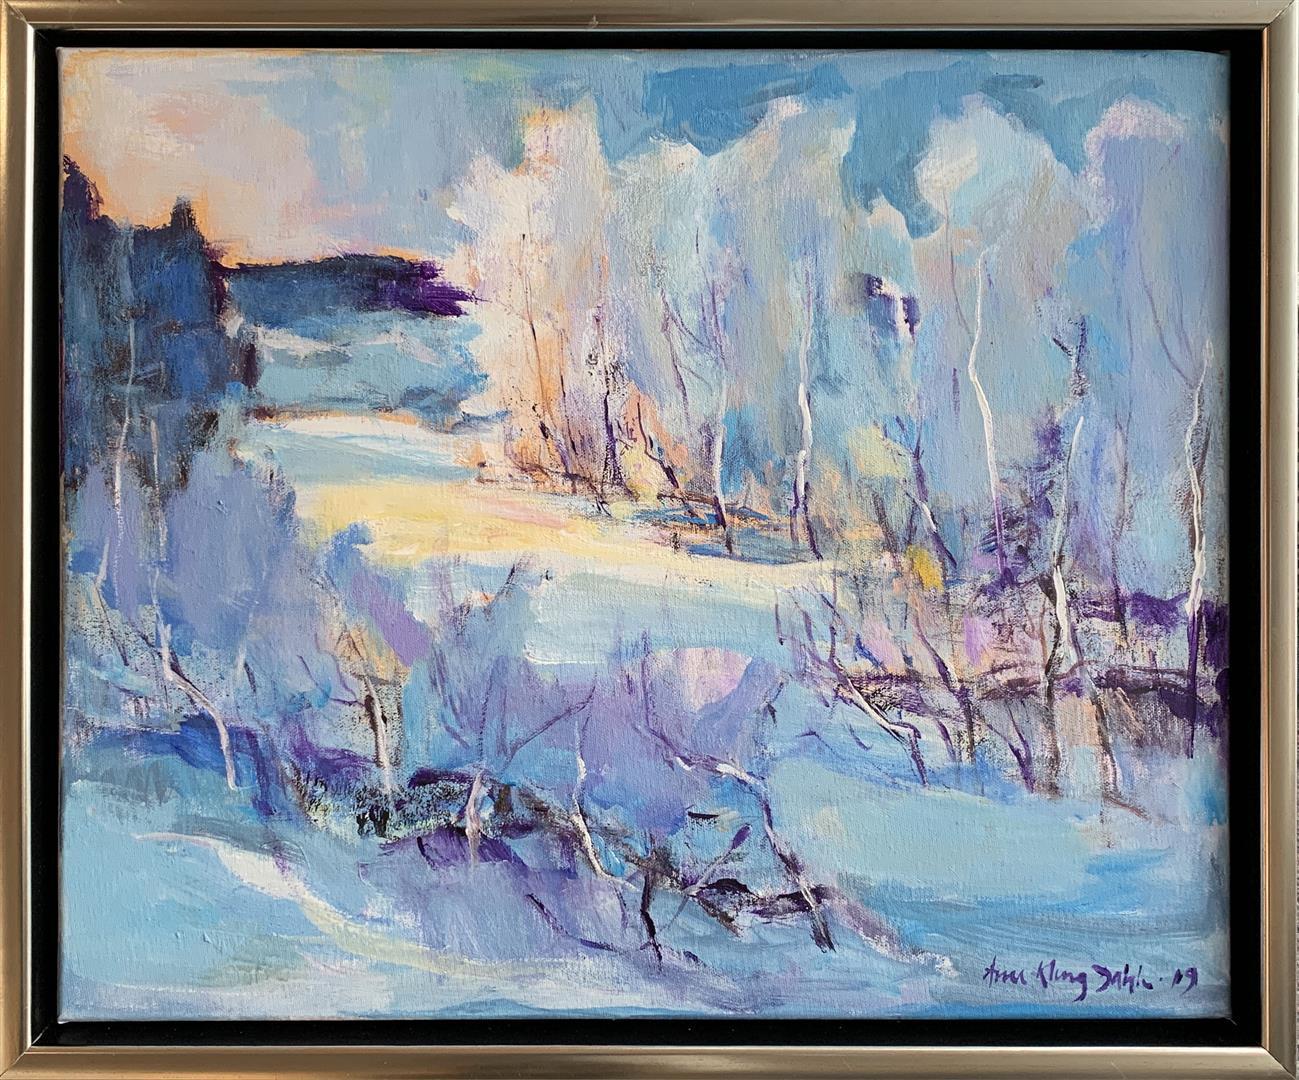 Arne Kleng Dahle: Senvinter Akrylmaleri (50x60 cm) kr 6000 mr